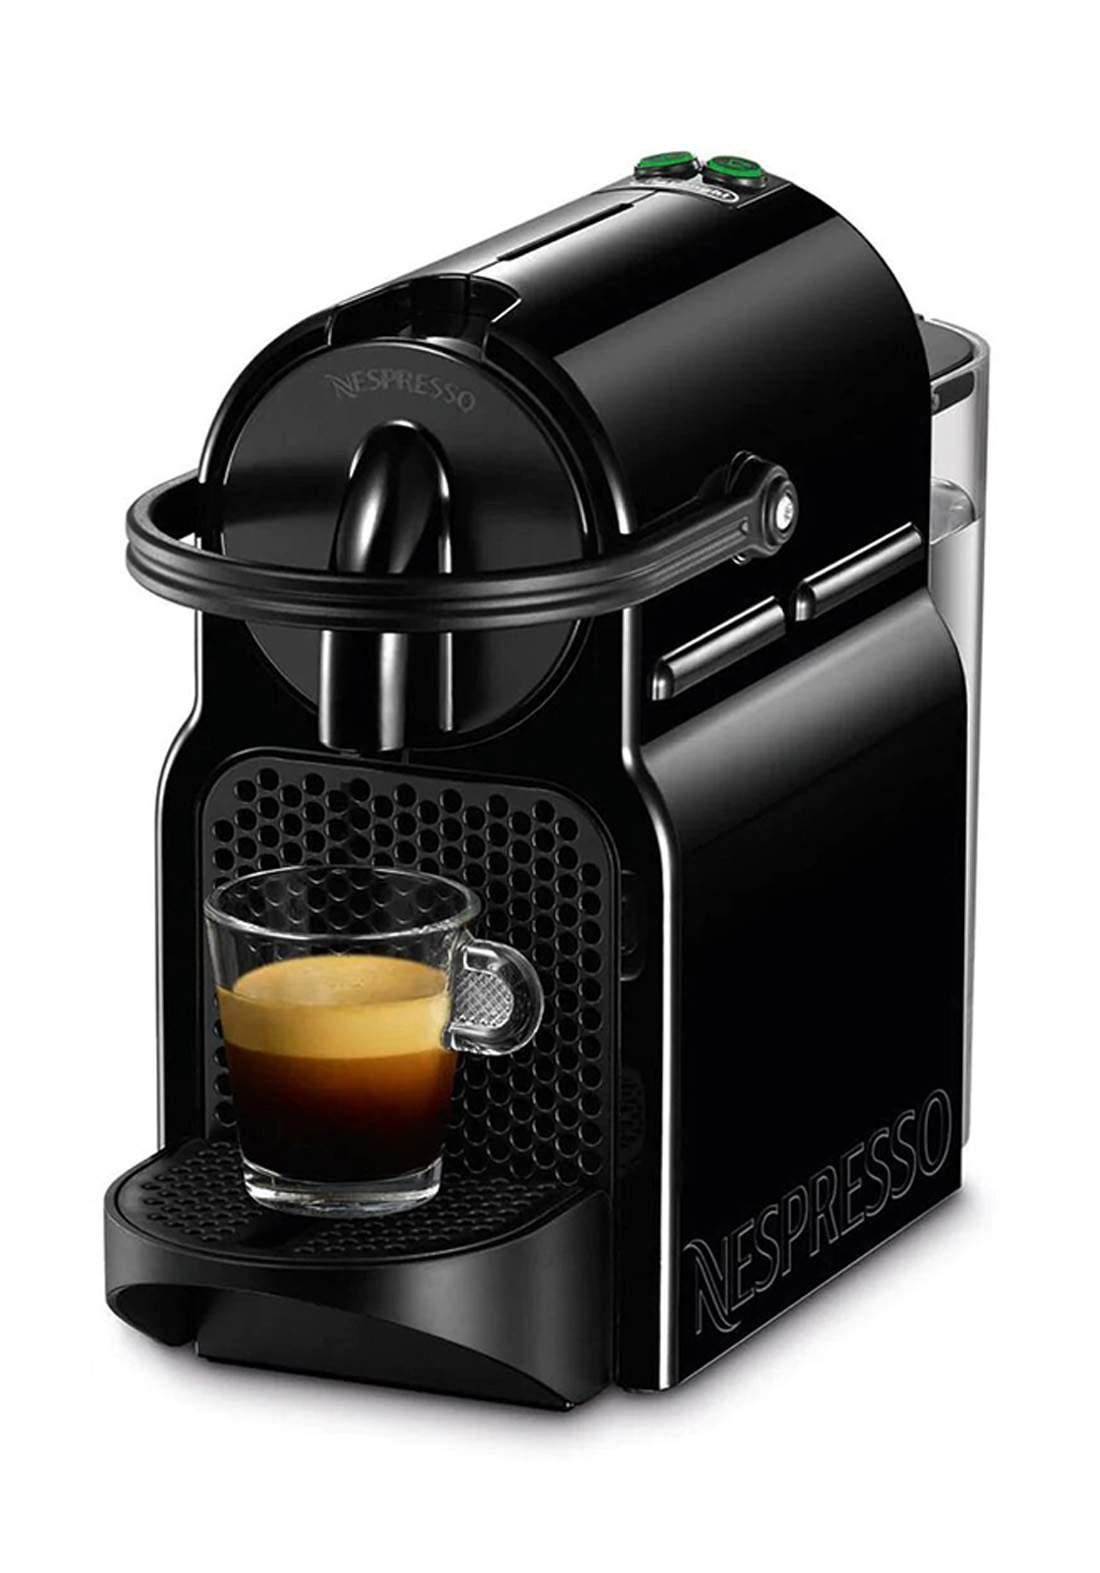 Delonghi EN80.B Coffee Machine 1200 Watt ماكنة صنع قهوة